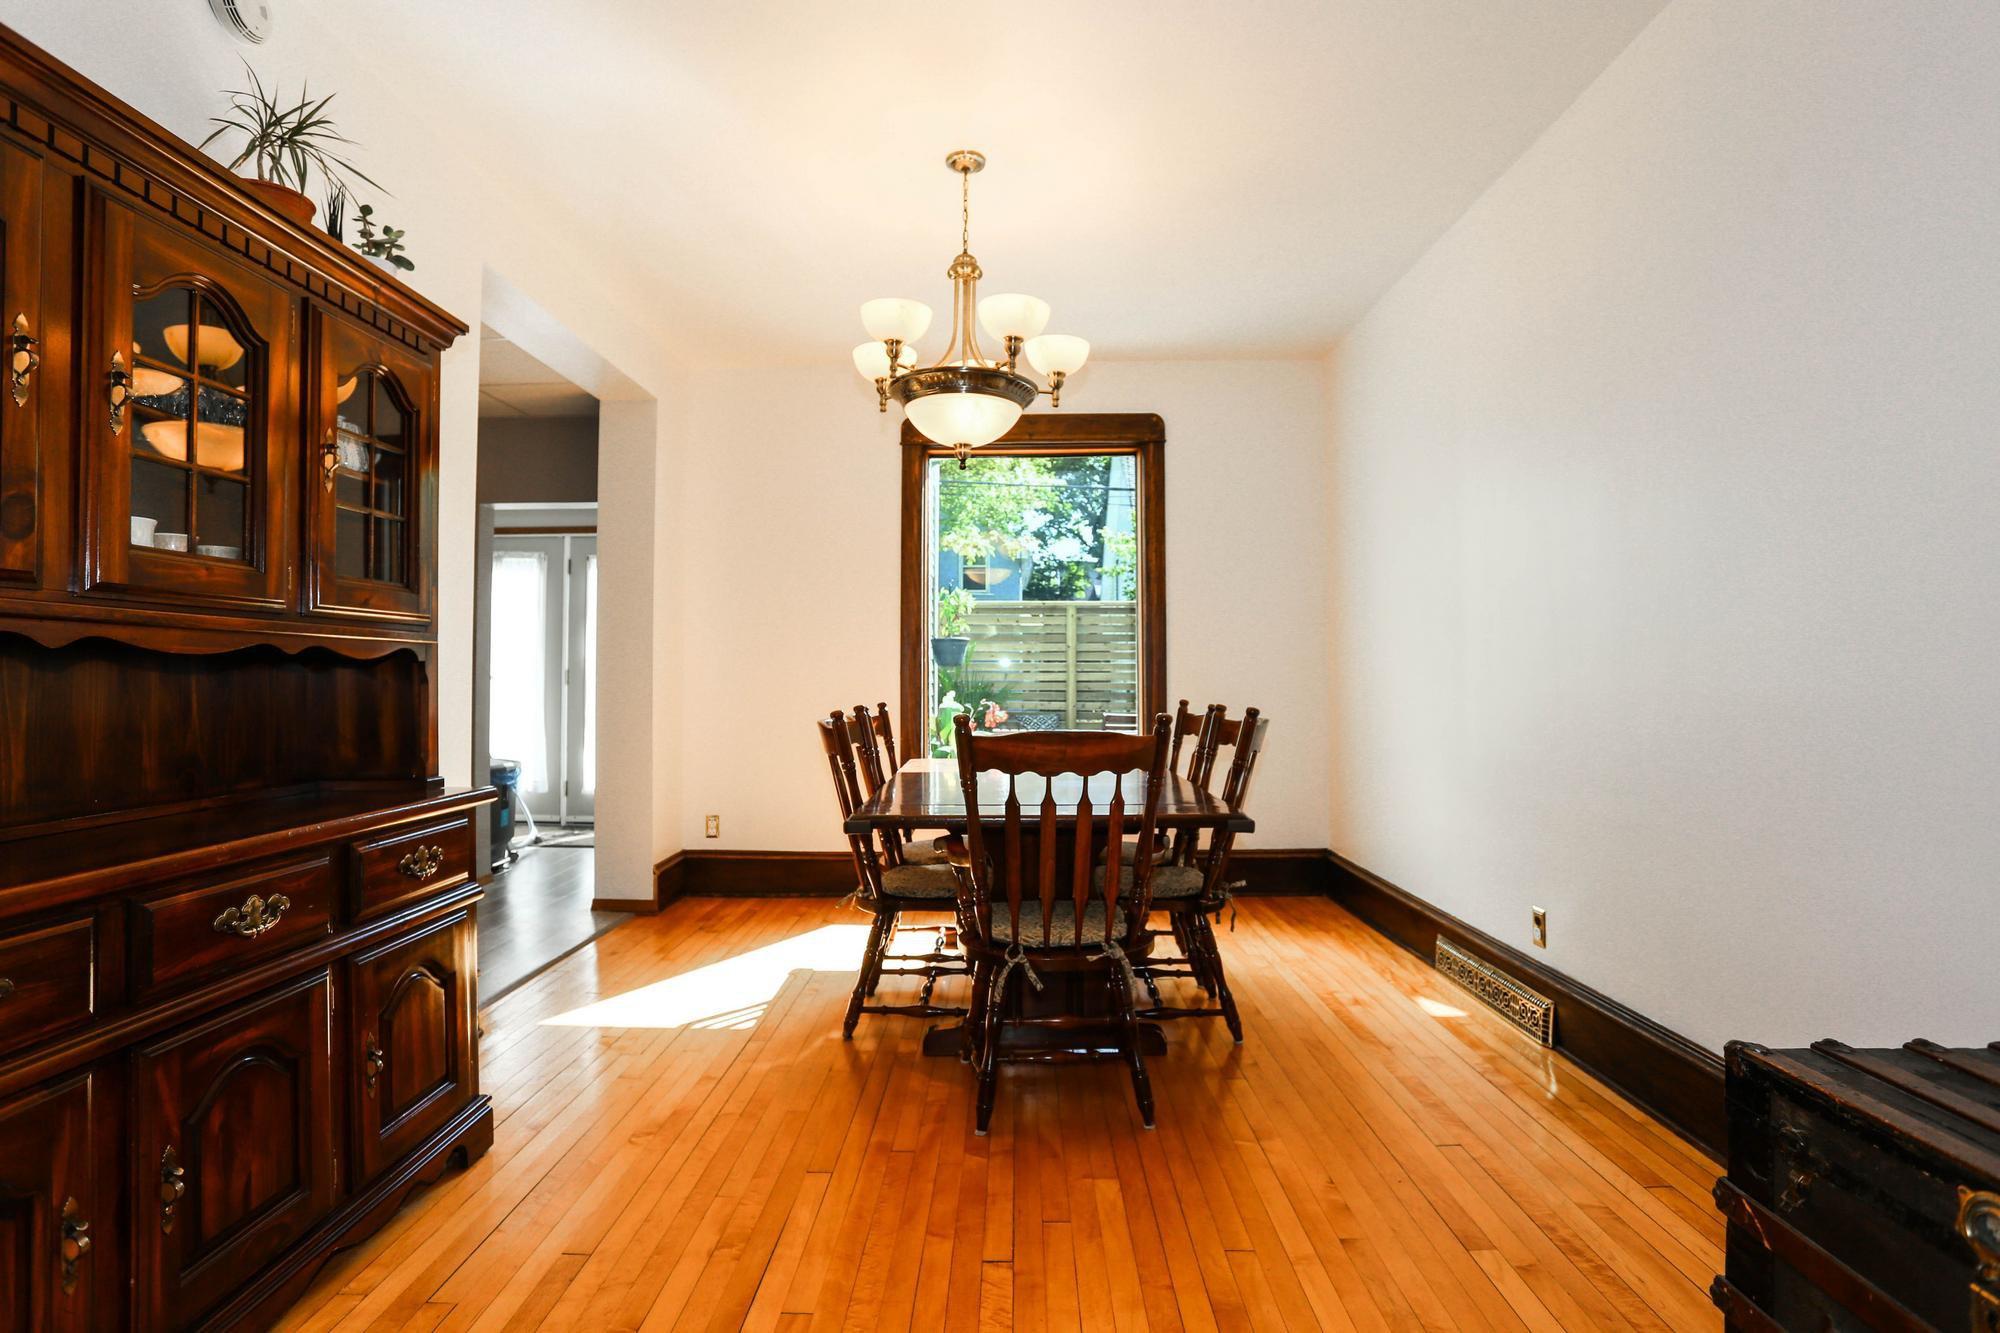 Photo 12: Photos: 105 Evanson Street in Winnipeg: Wolseley Single Family Detached for sale (5B)  : MLS®# 1821900